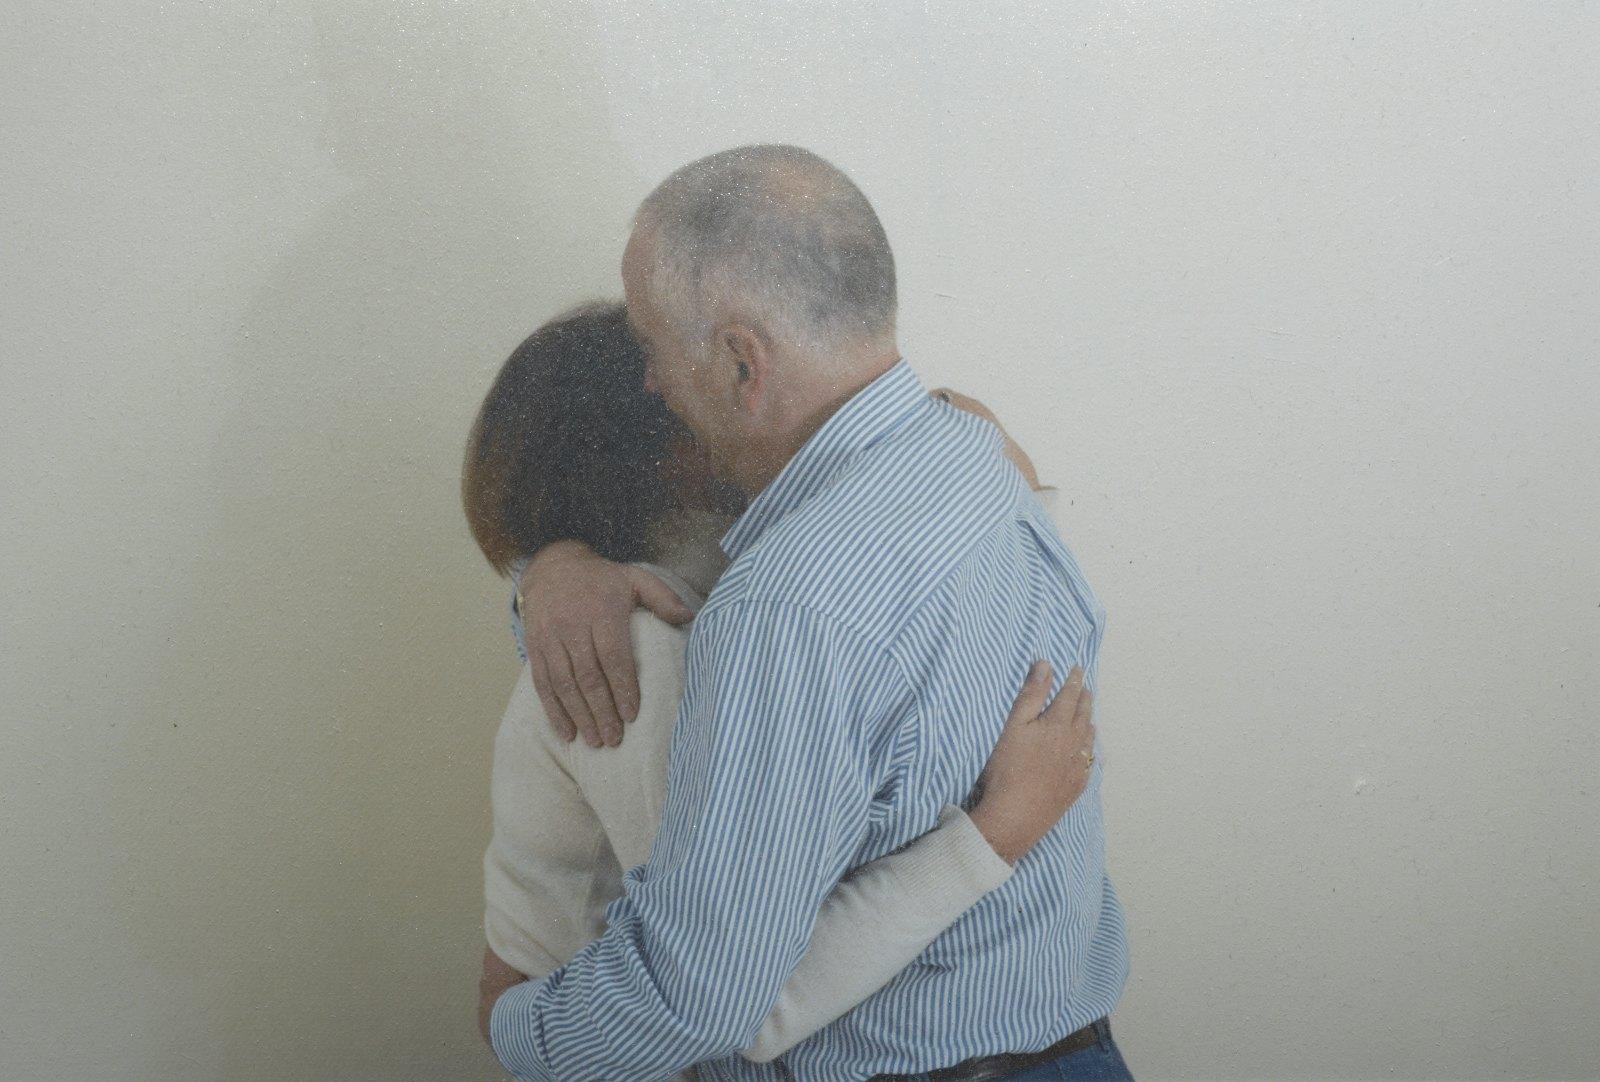 Third party, 2010, c-print, 56 x 79,6 cm. Ed. 5